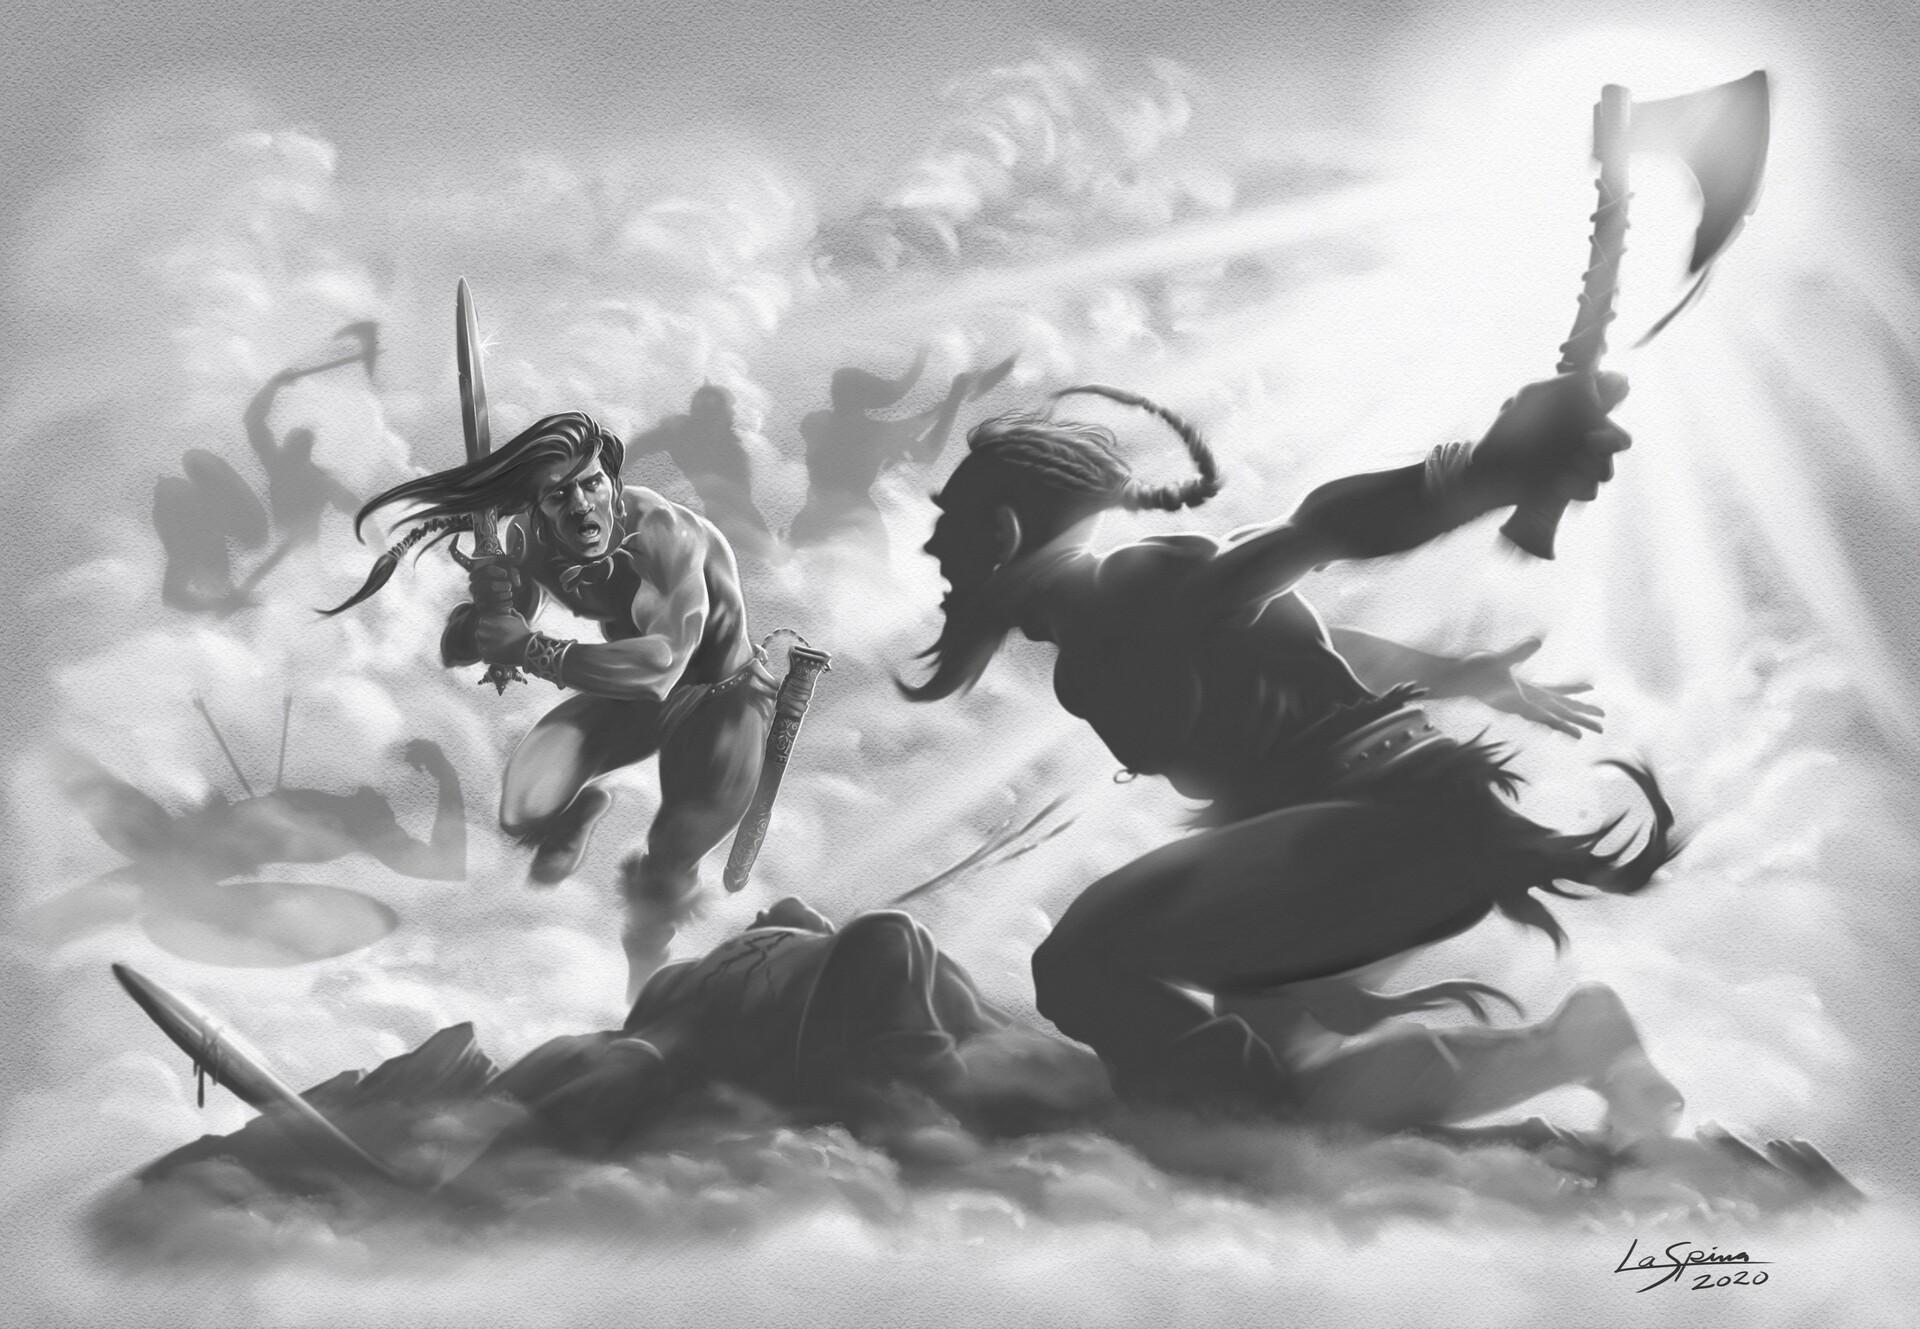 Charging Barbarian